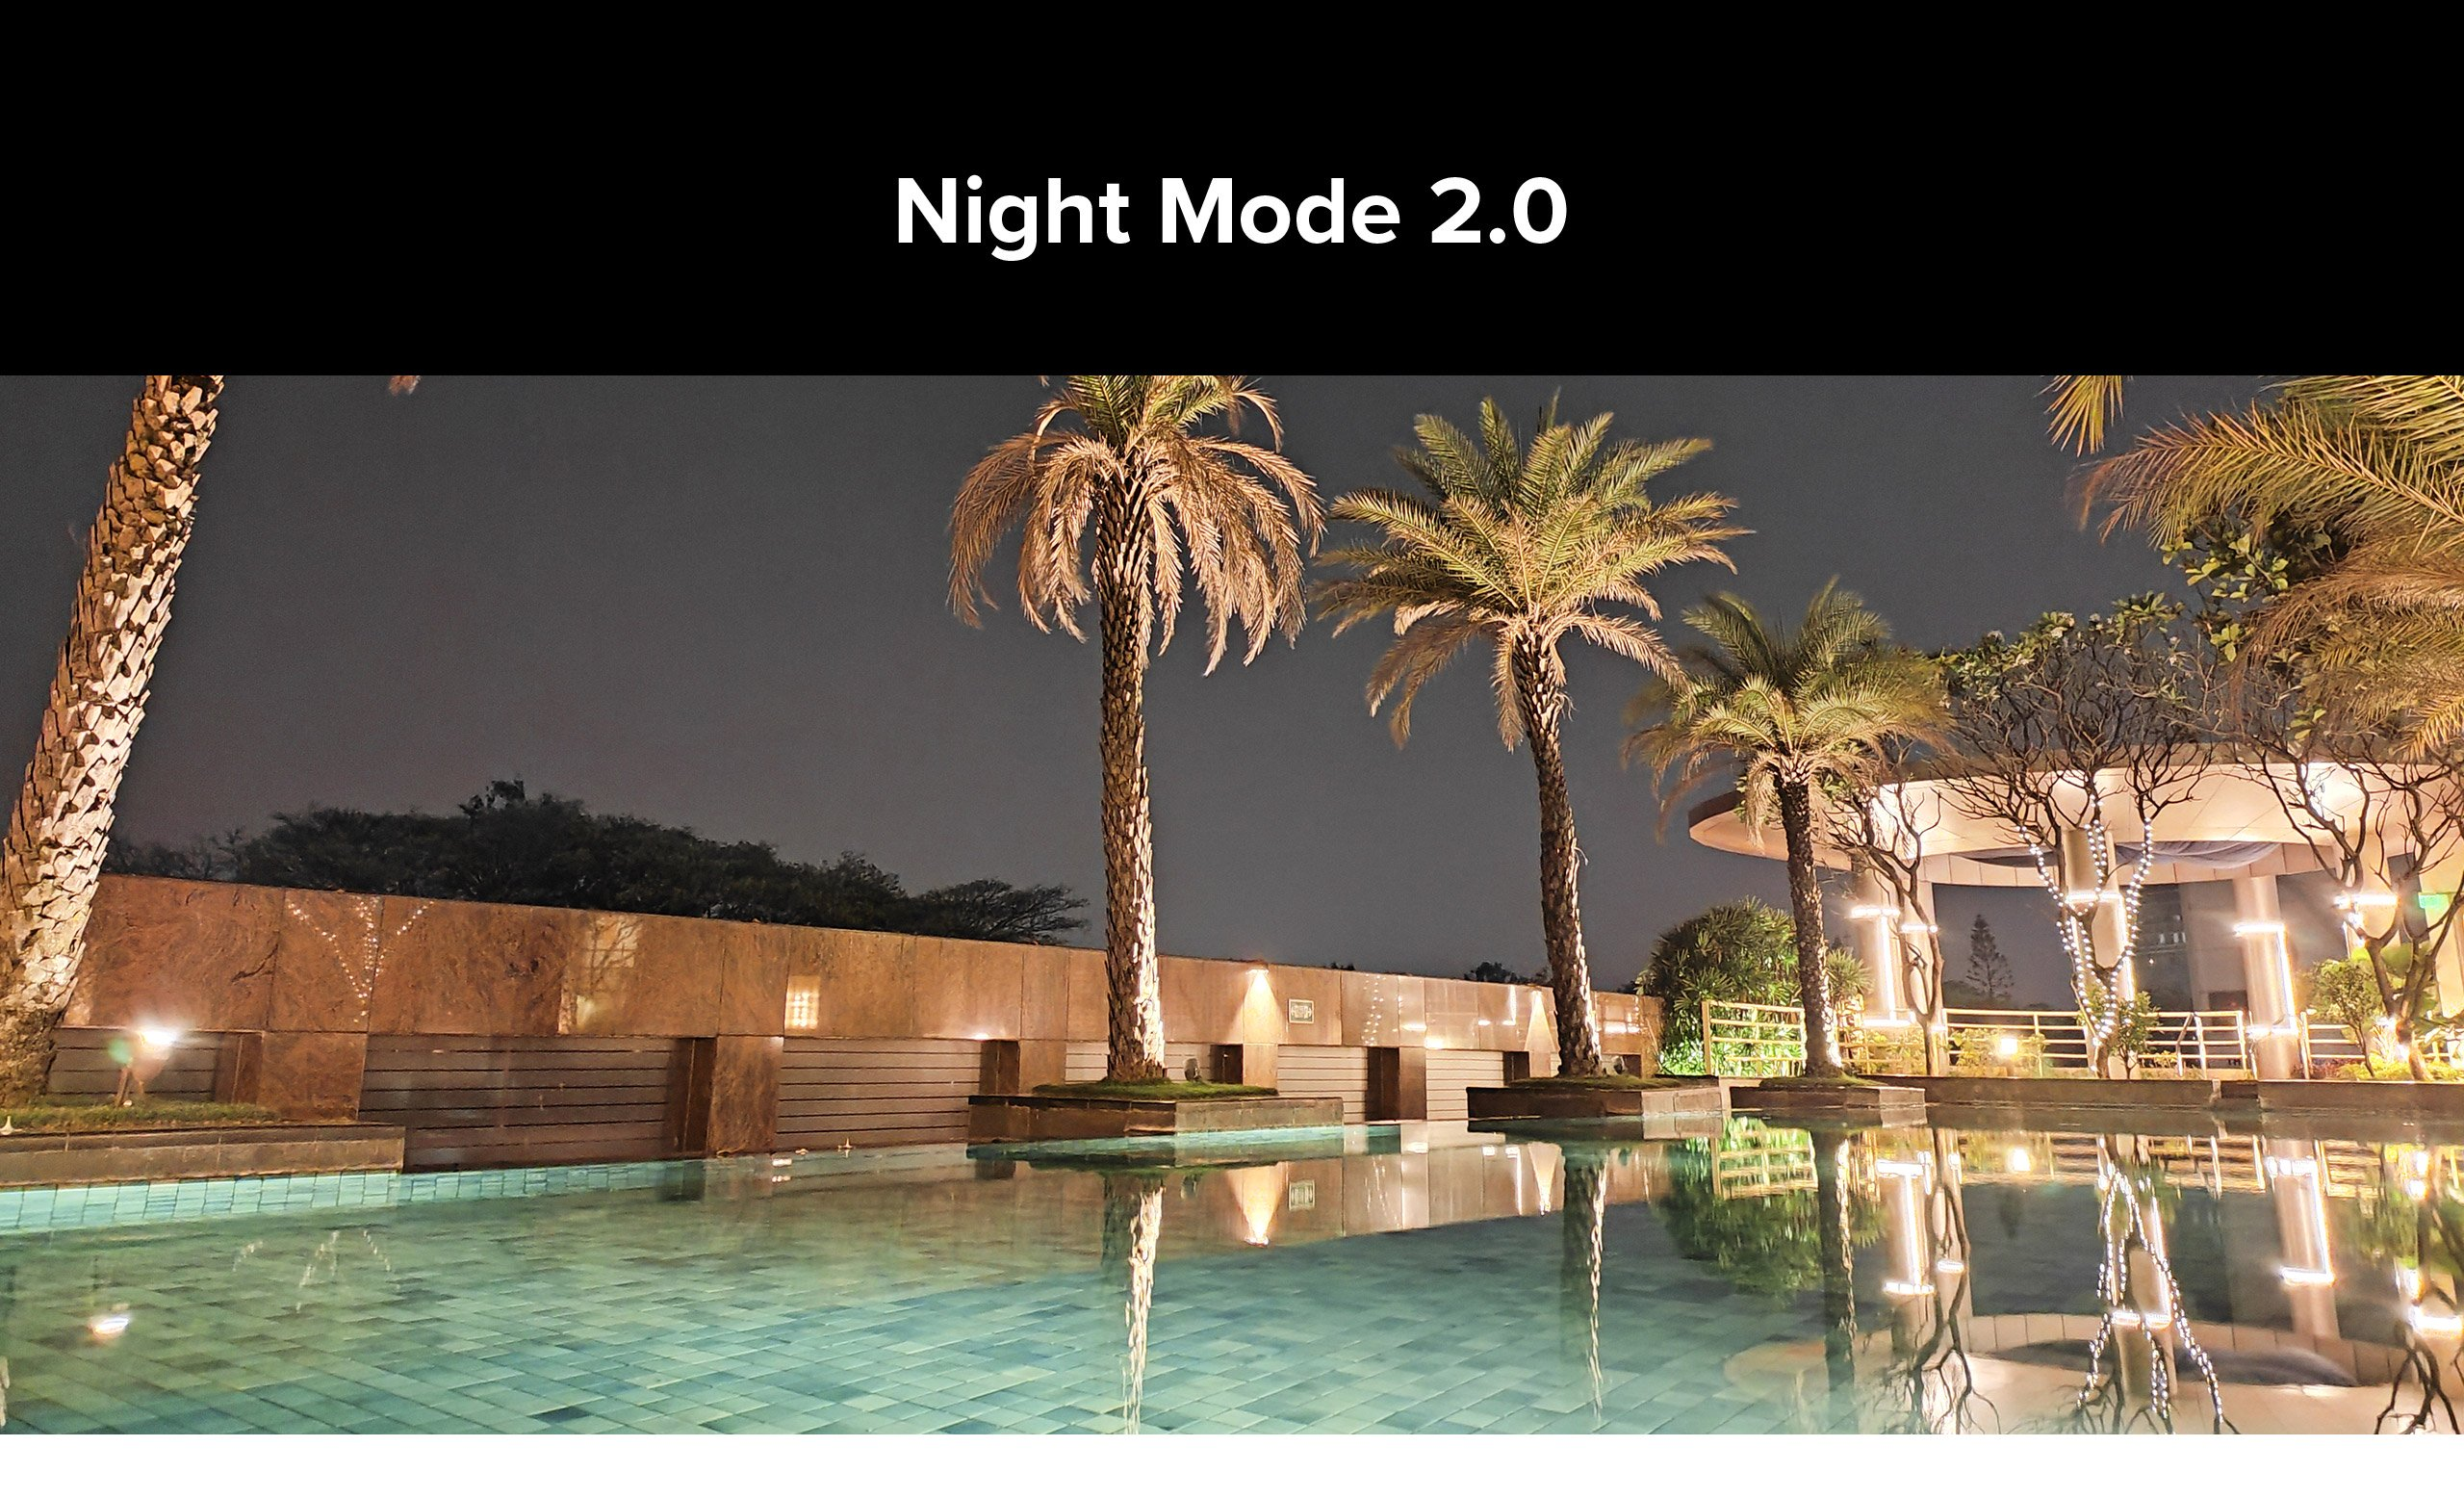 redmi note 10 pro night mode